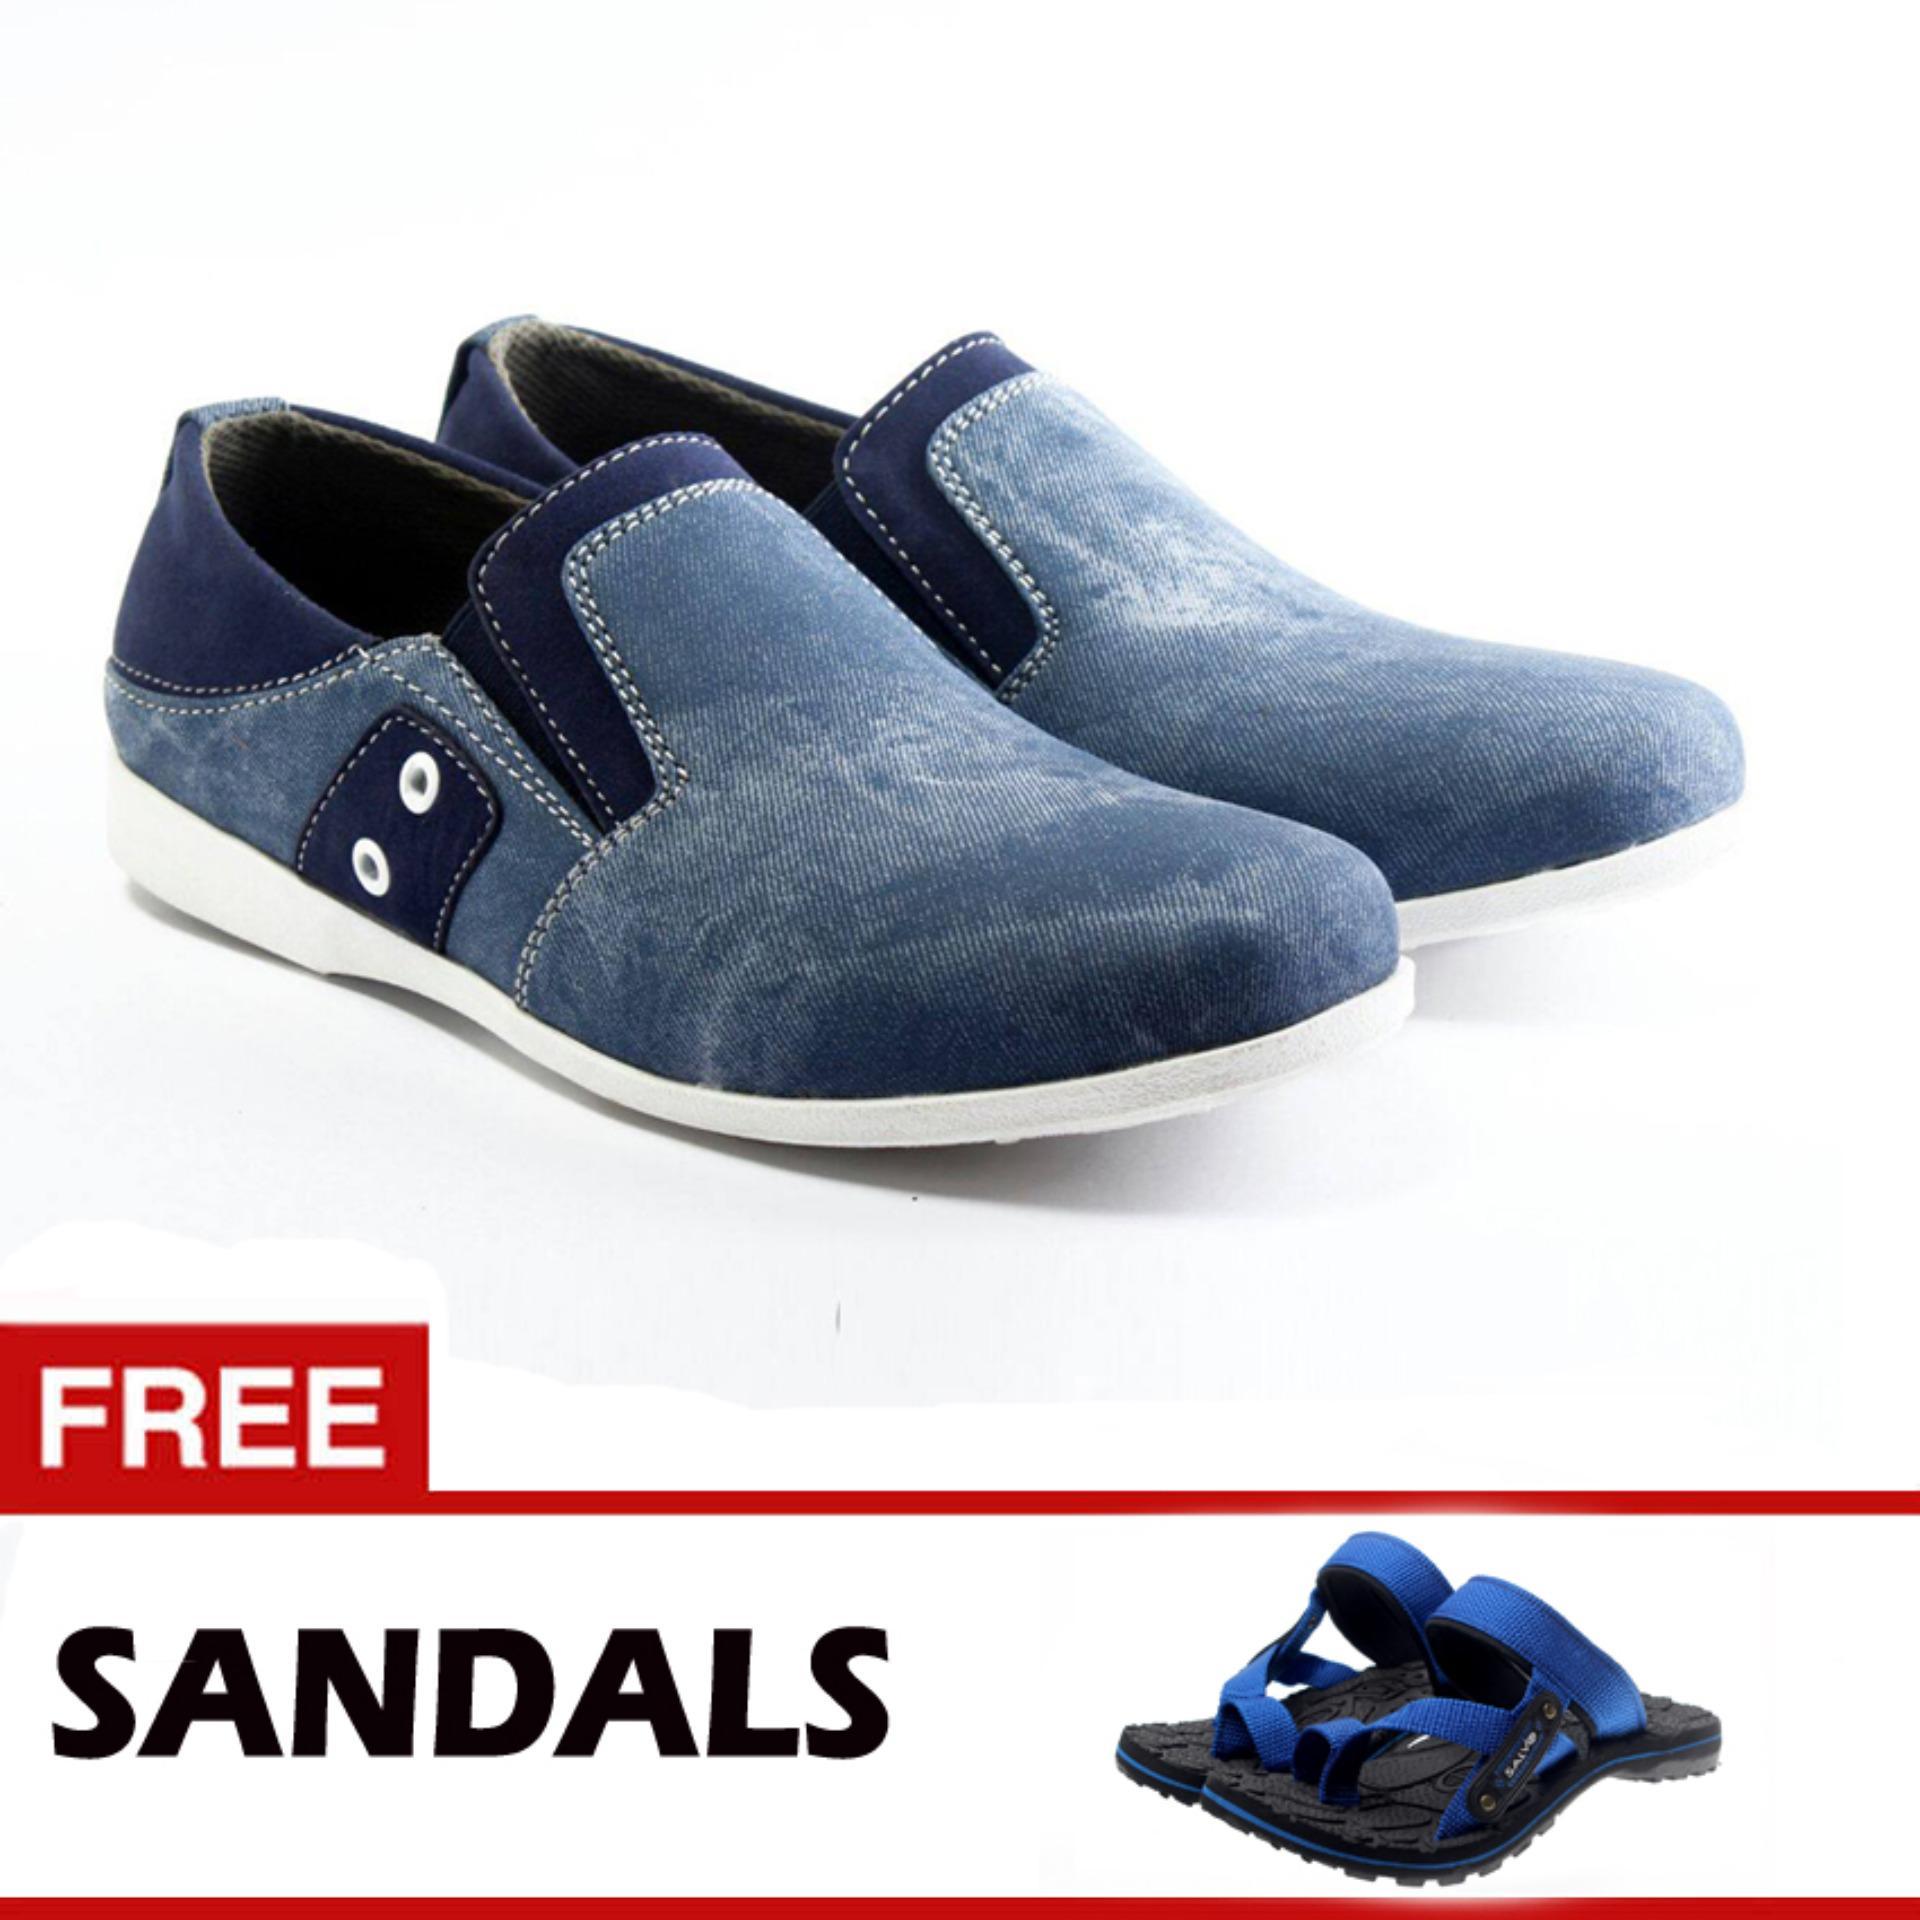 Salvo sepatu denim SC biru free sandal SG01 biru